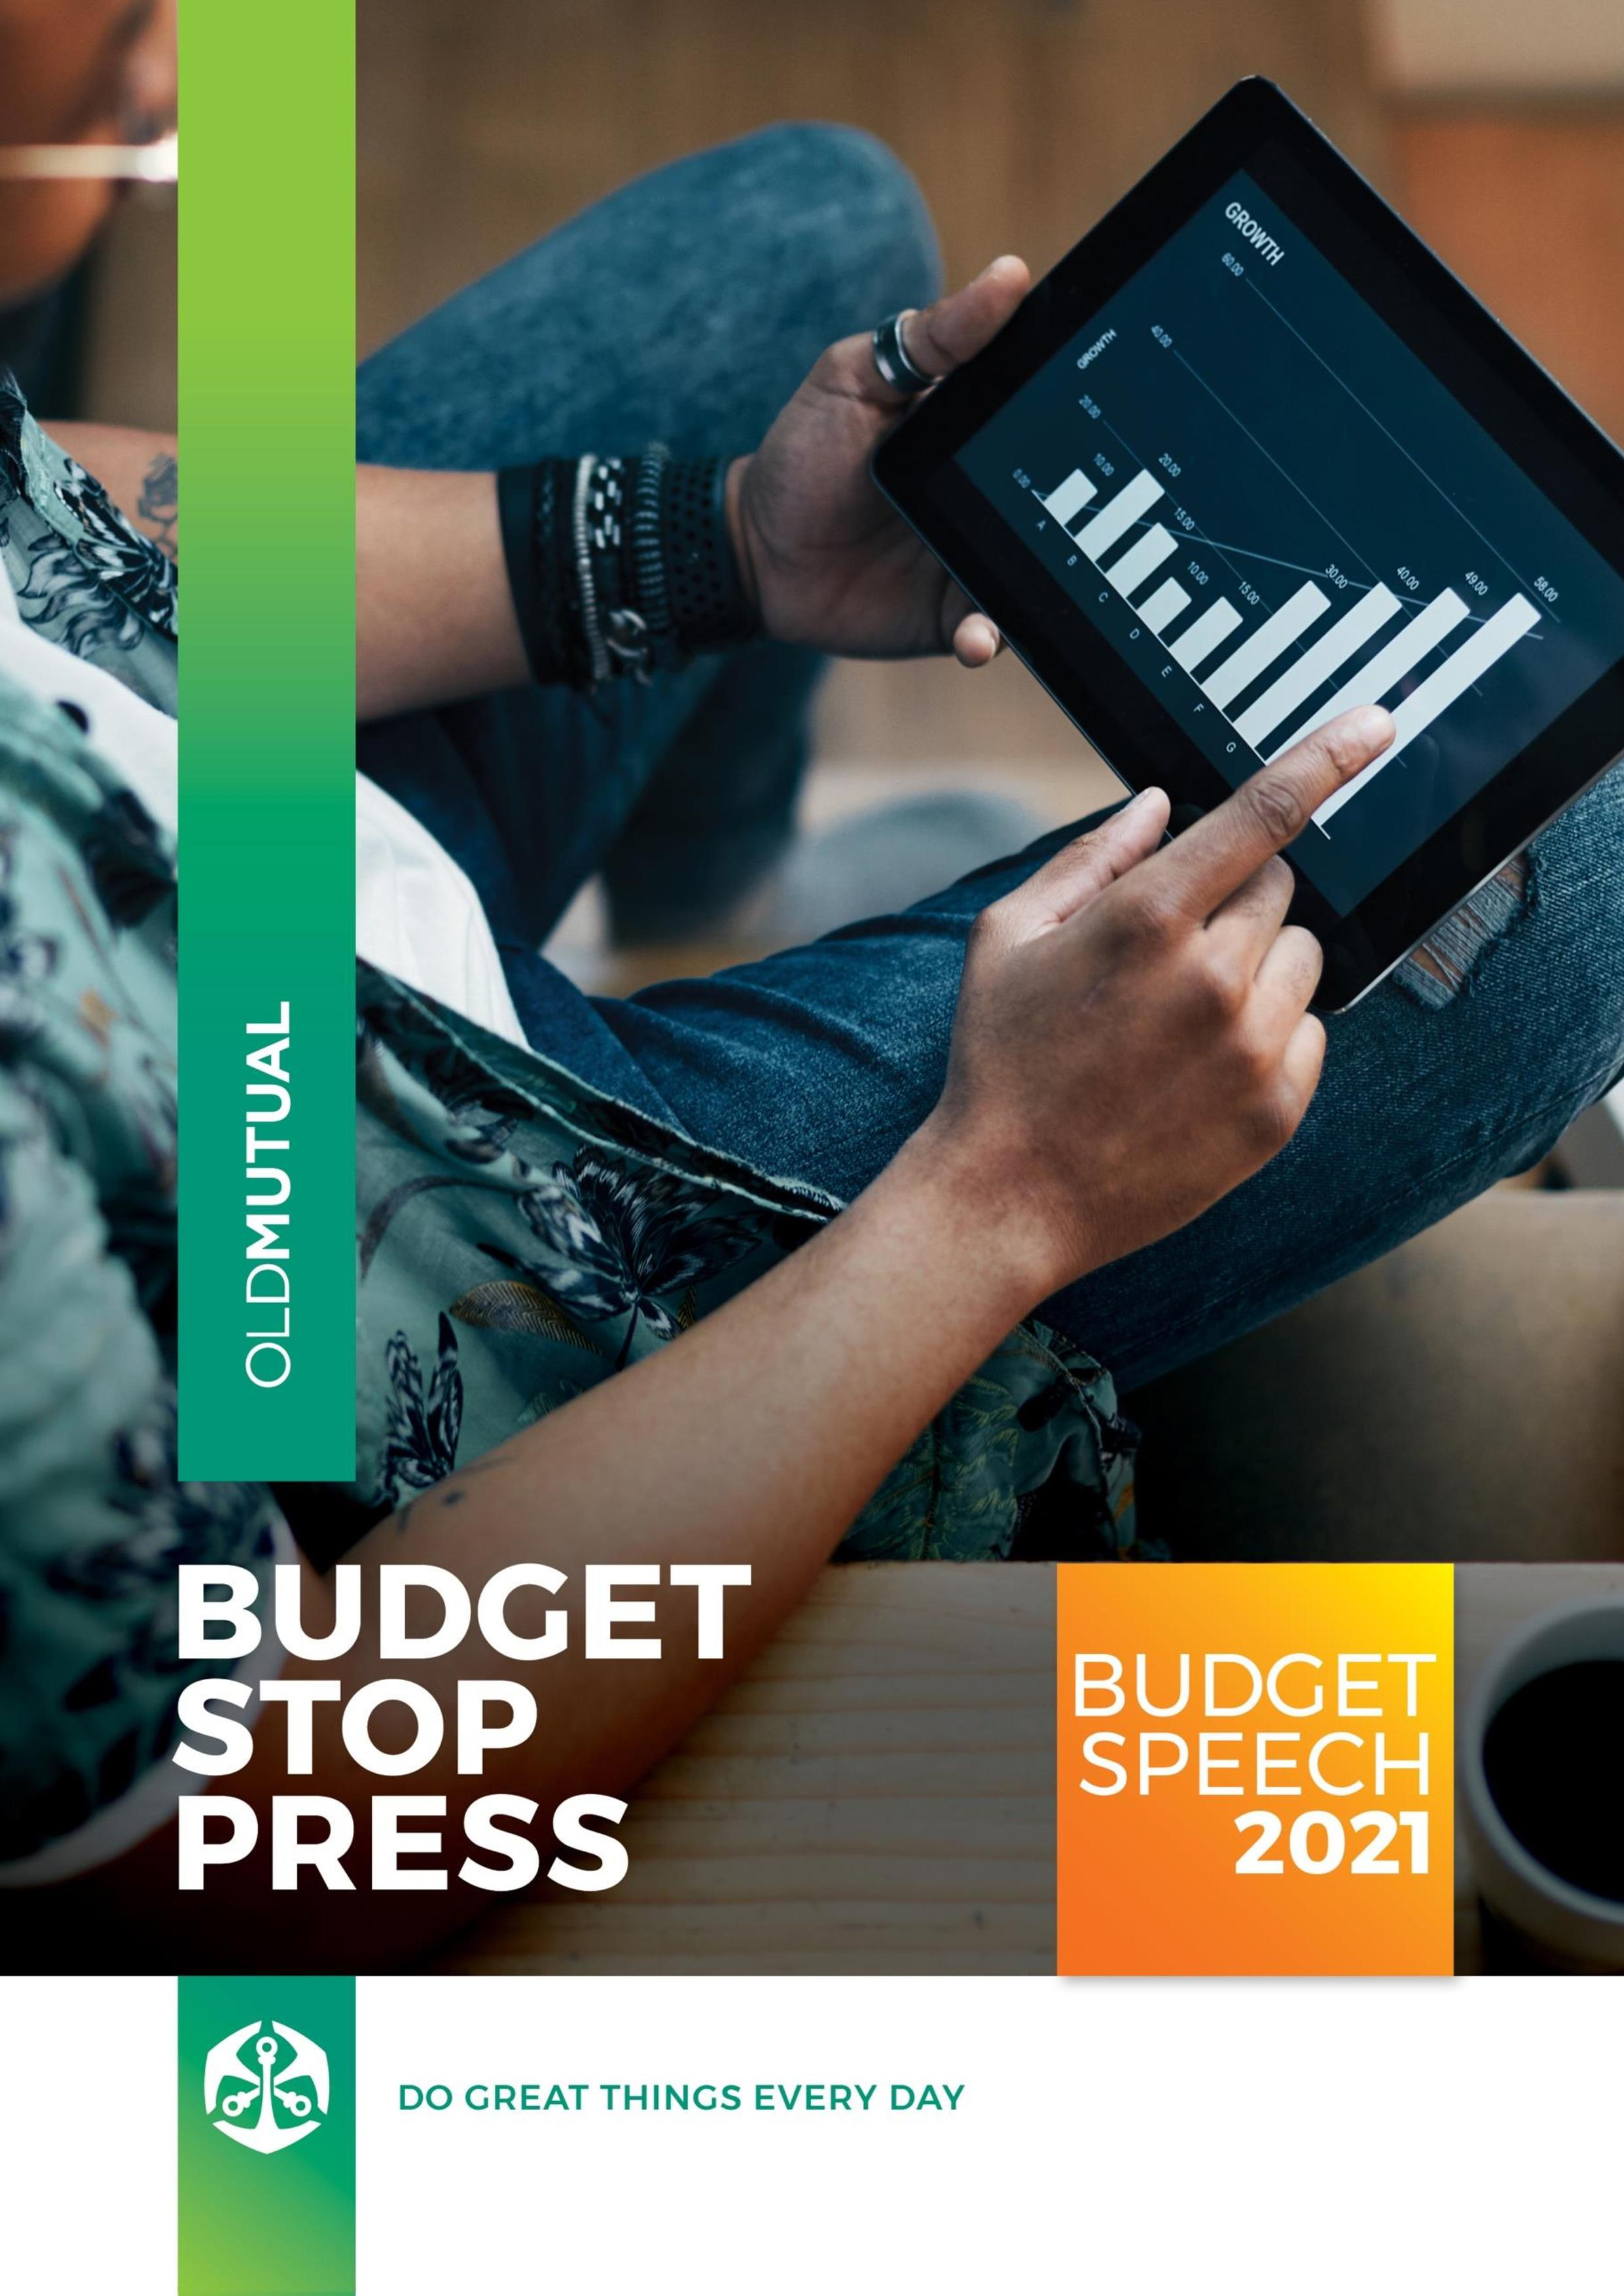 Old Mutual - 2021 Budget speech